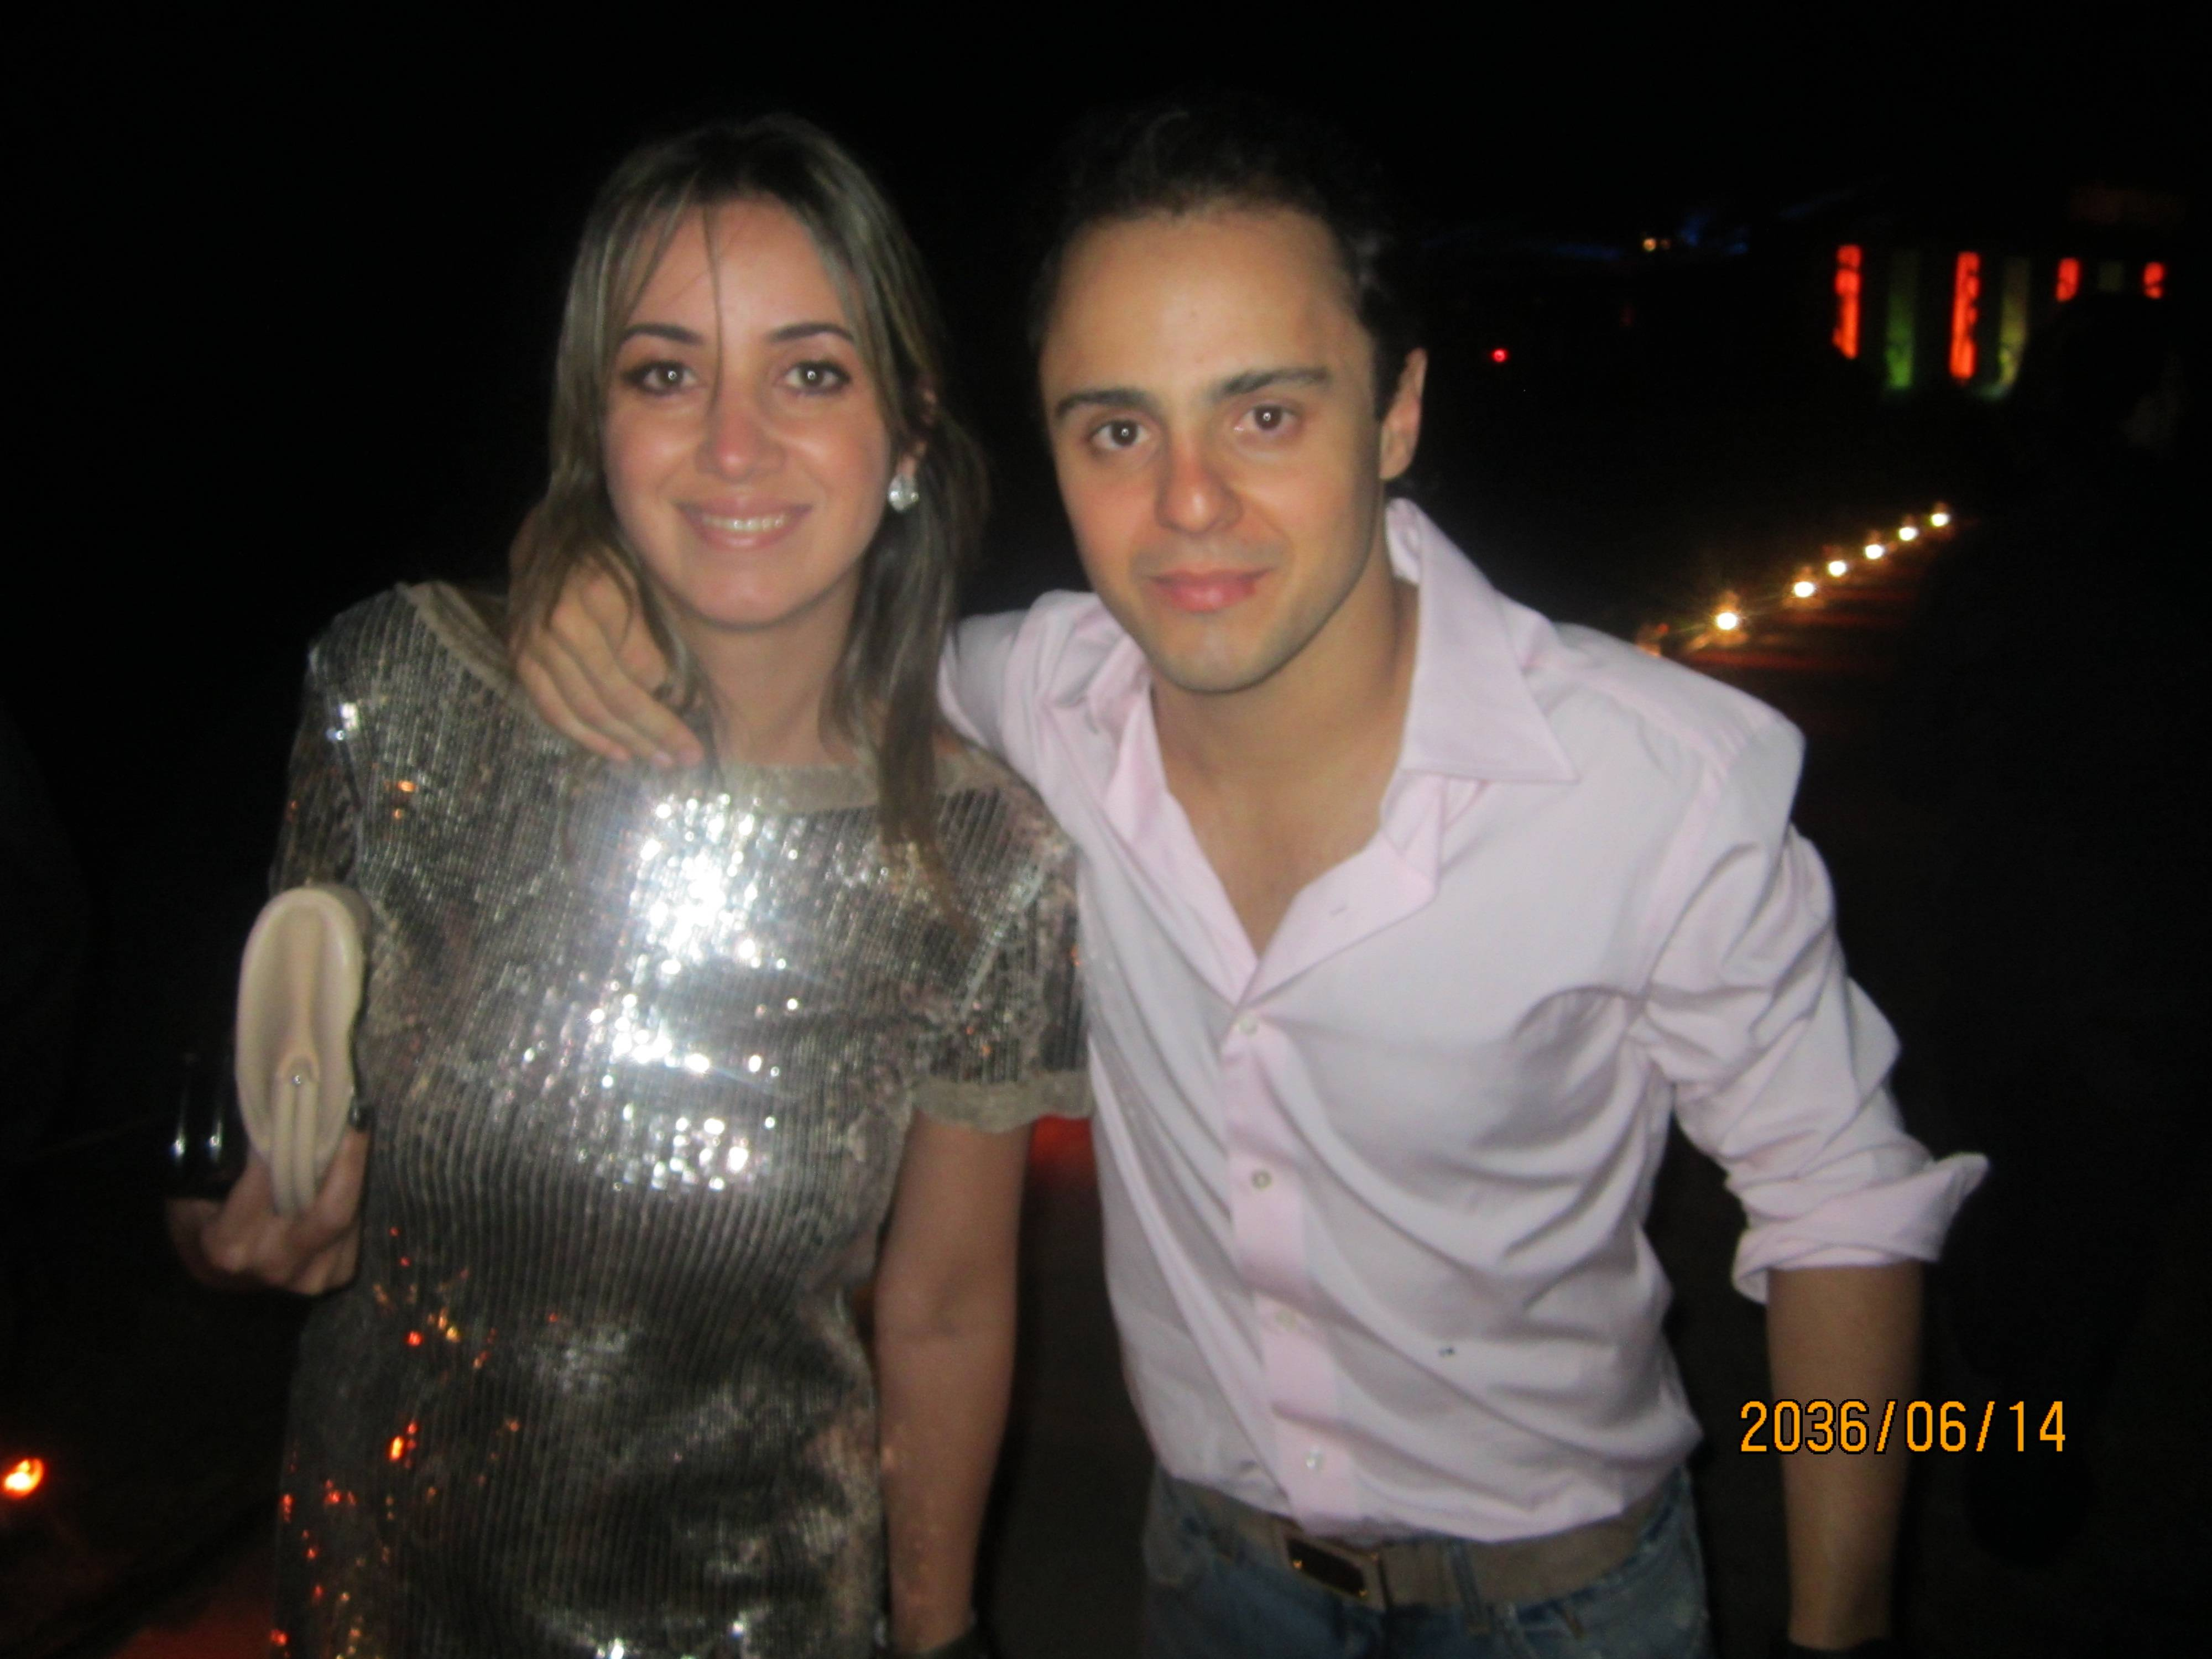 Felipe Massa and partner